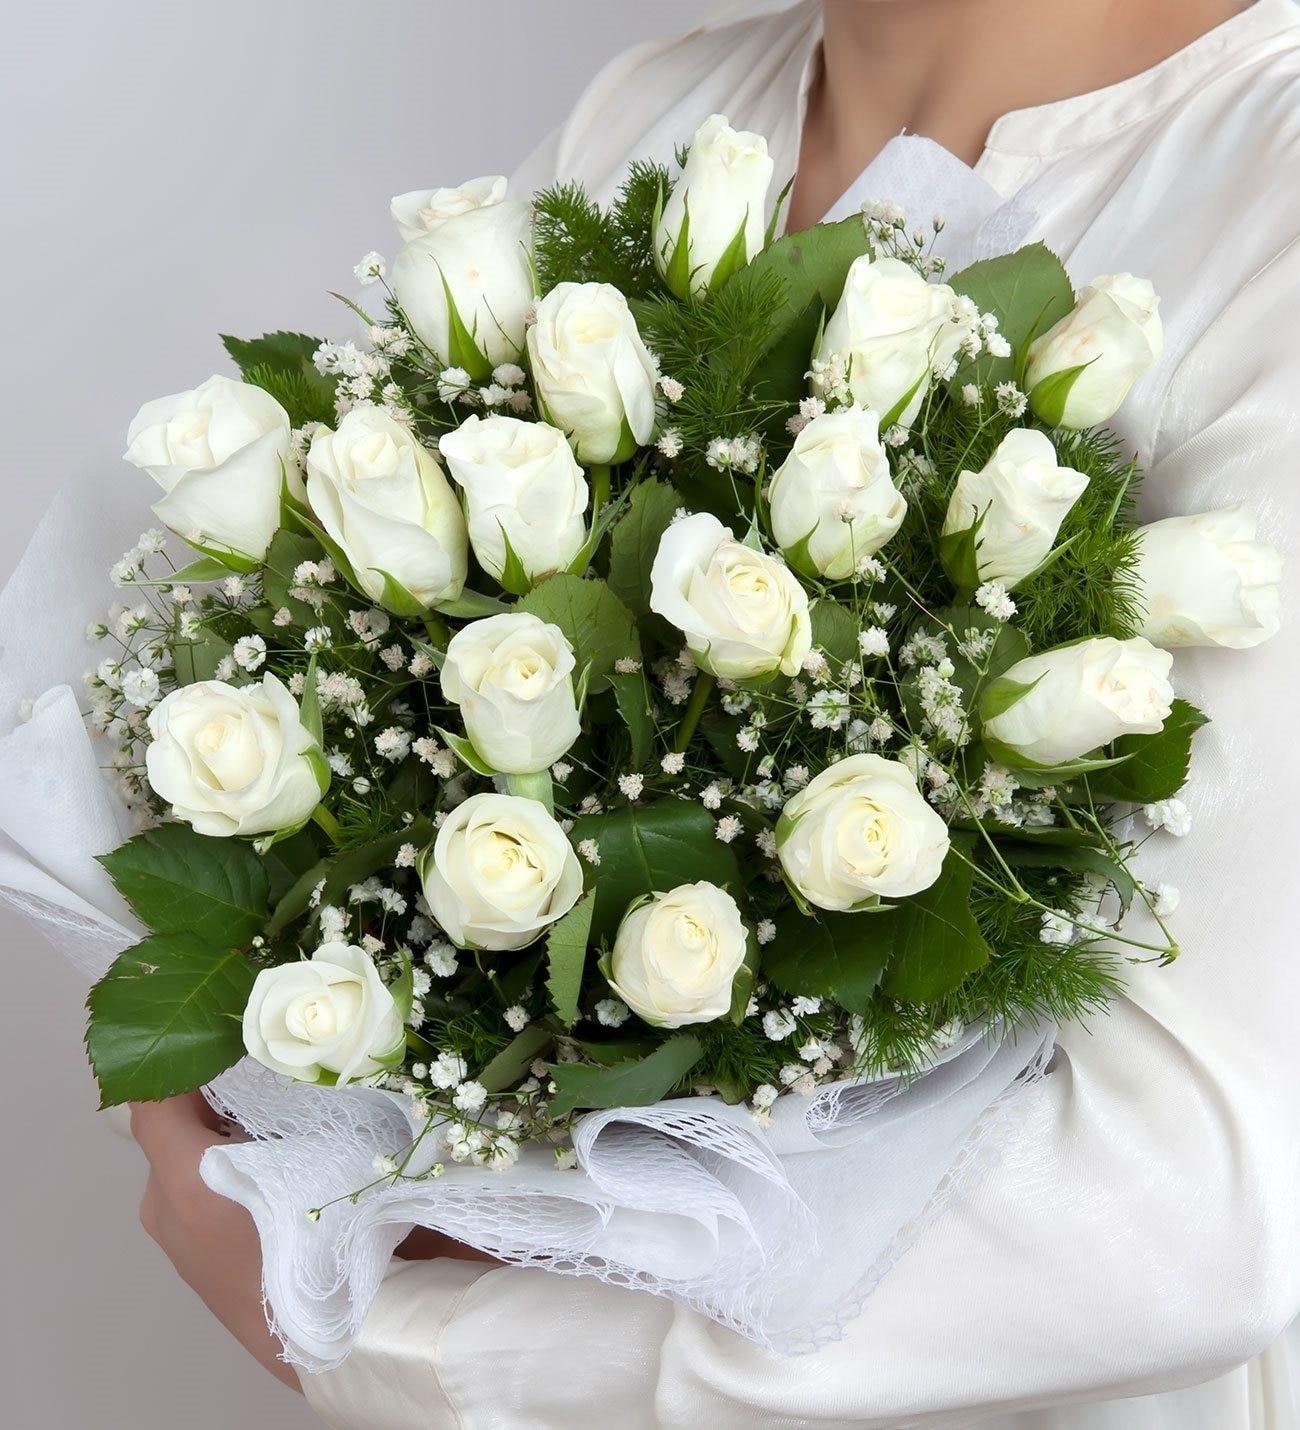 19 Rosas Frescas Blancas Envueltas En Género